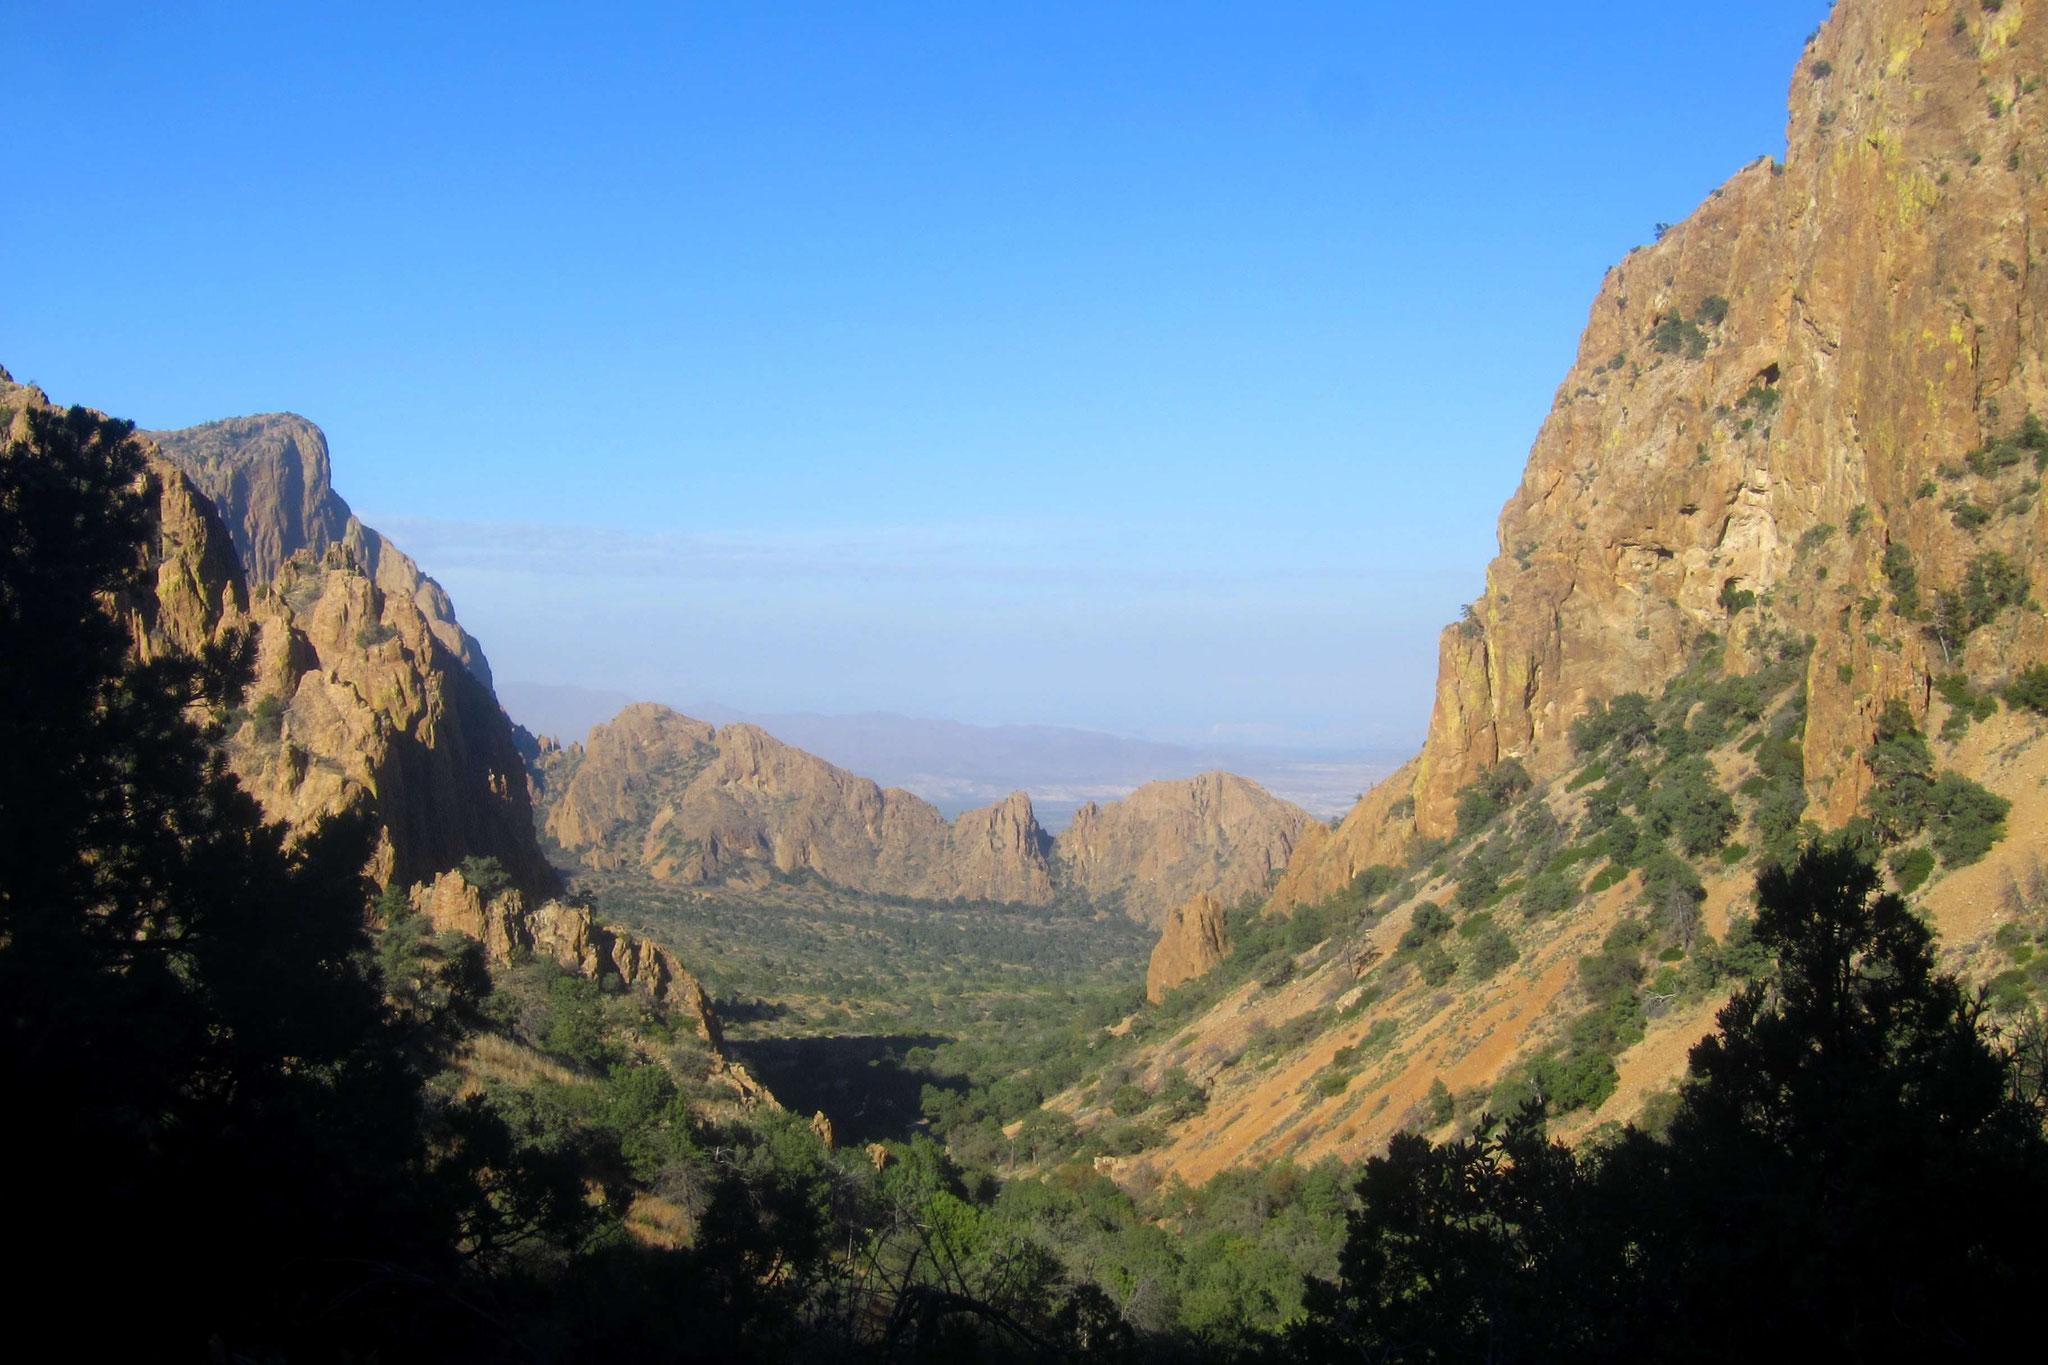 Blick hinunter in den Chisos Basin Richtung Besucherzentrum